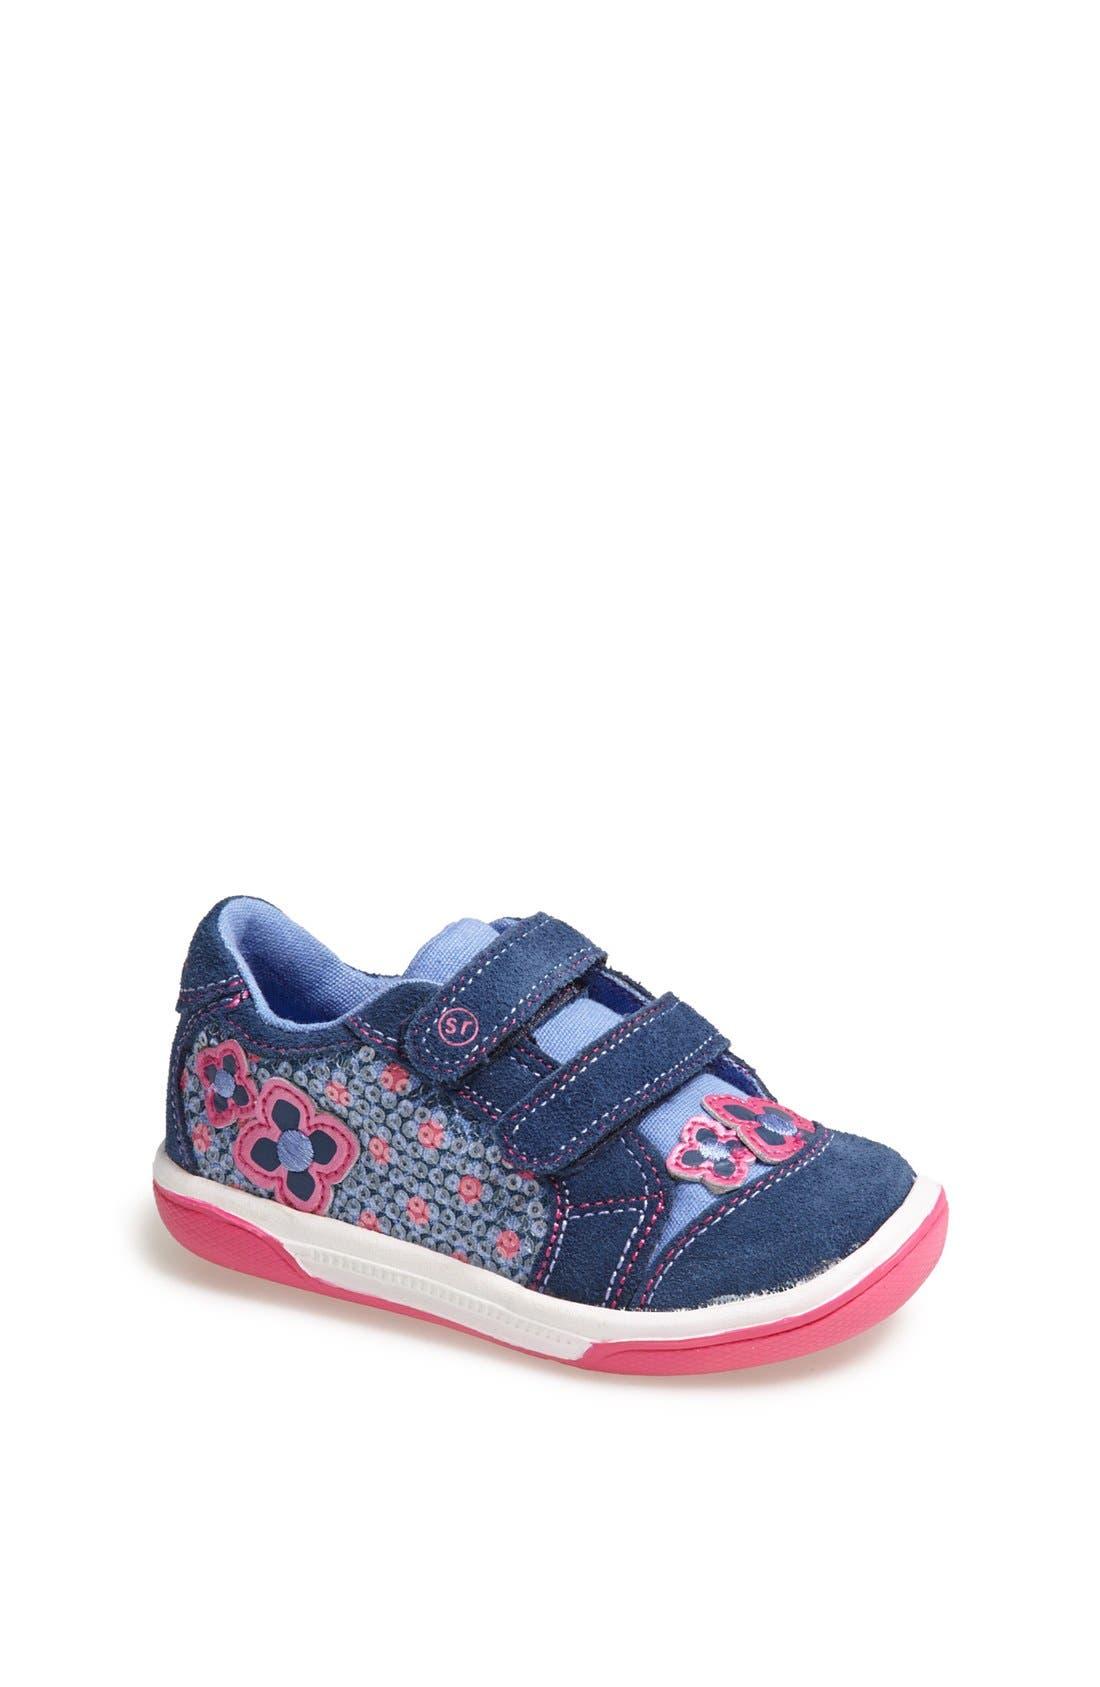 Alternate Image 1 Selected - Stride Rite 'Ryder' Sneaker (Baby, Walker & Toddler)